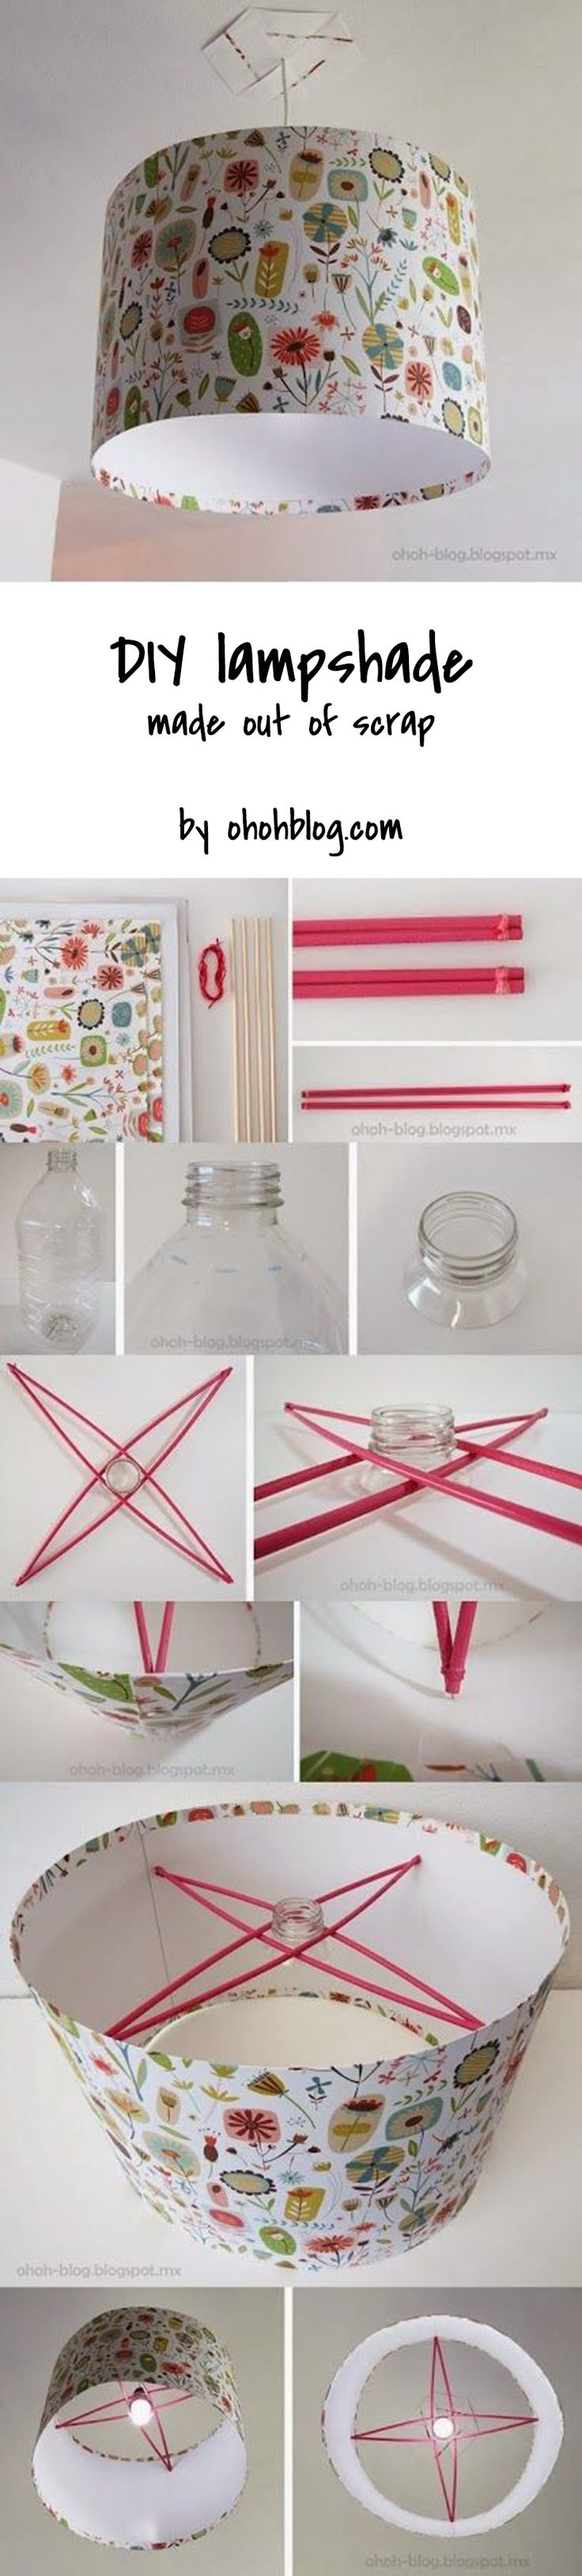 Made a stunning lampshade out of scrap material! DIY lighting - DIY lampshade